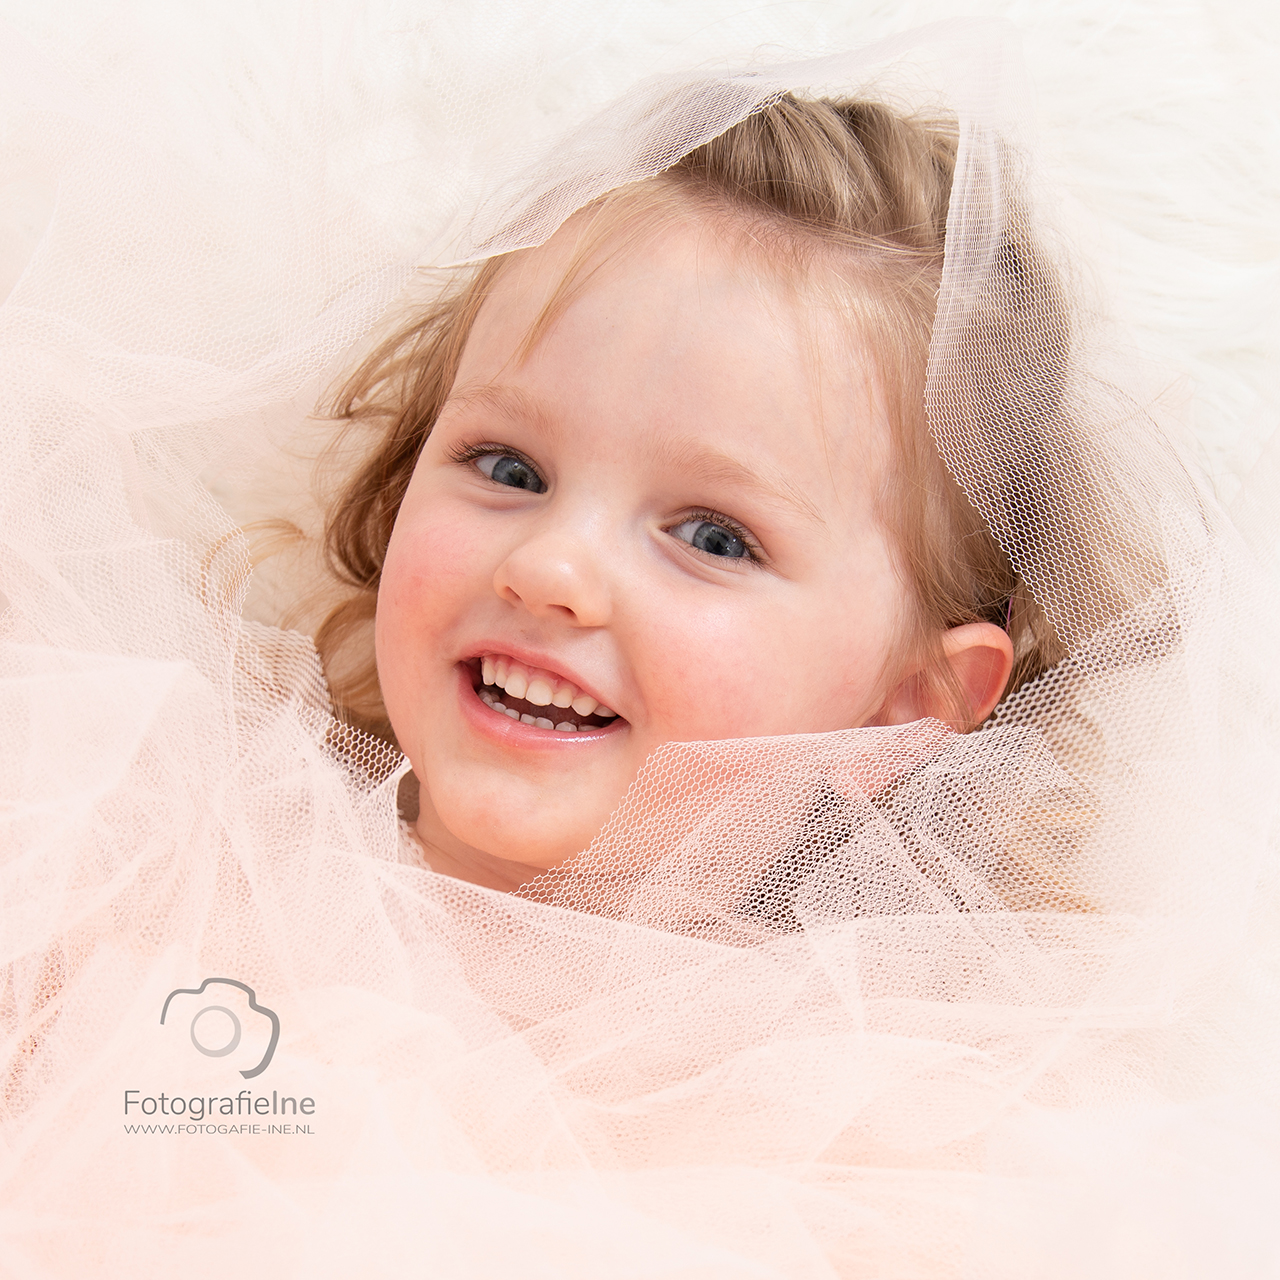 Fotografie Ine Prinsessen fotoshoot lief